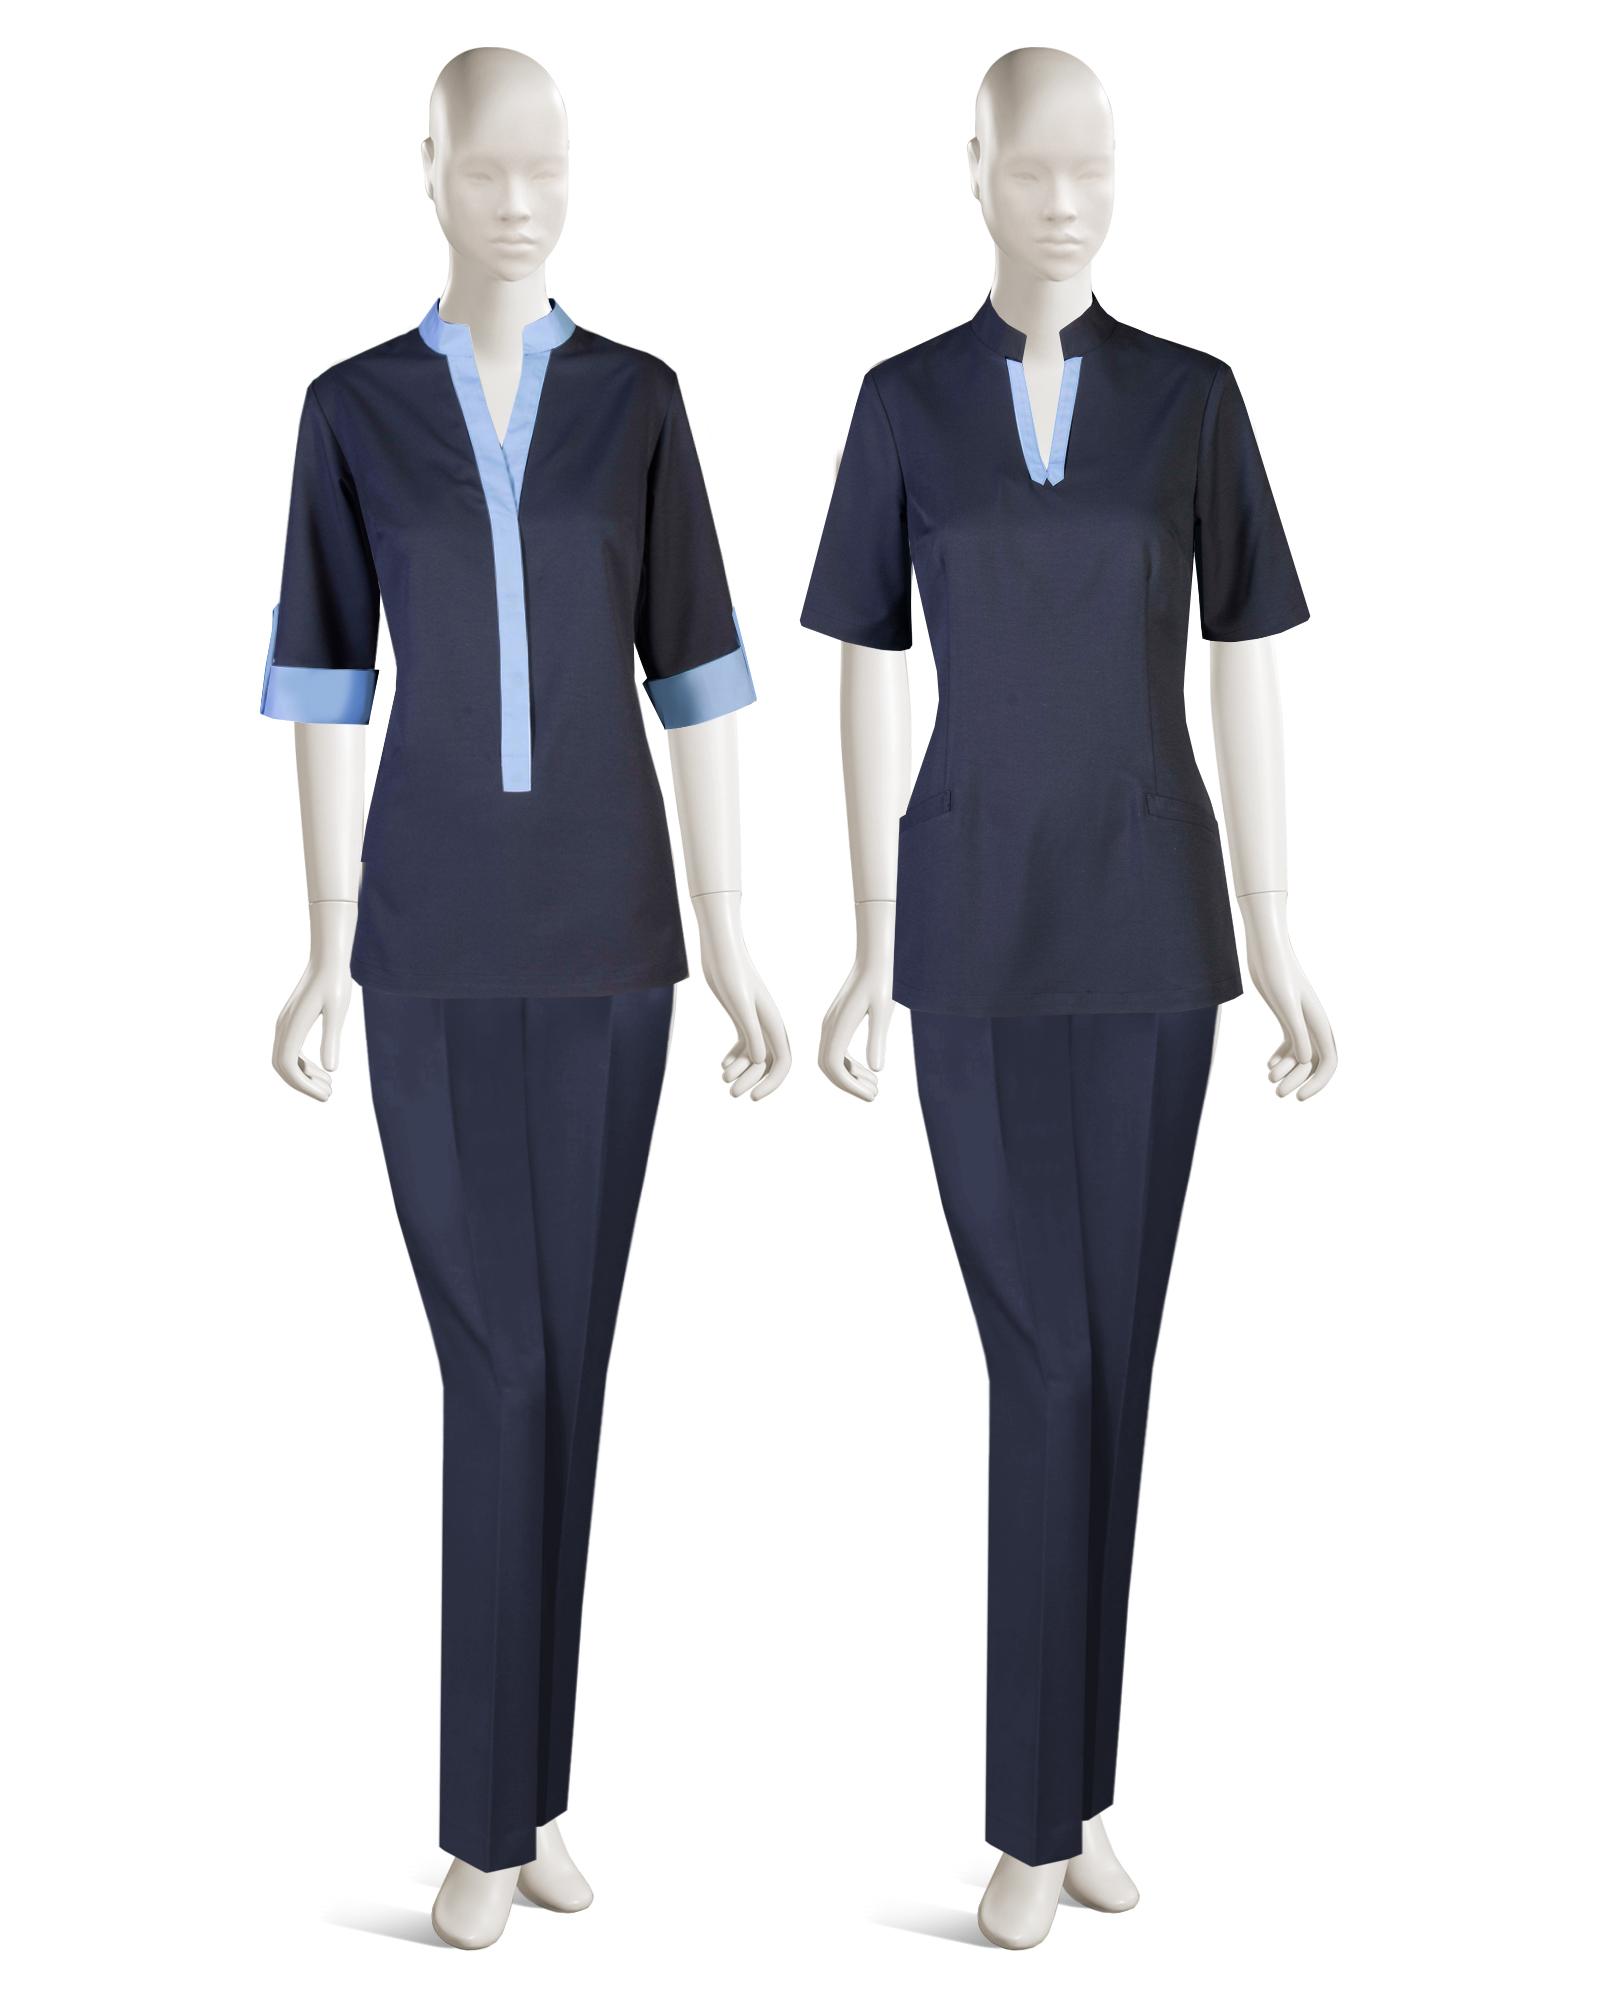 Sp165 for Uniform spa manager